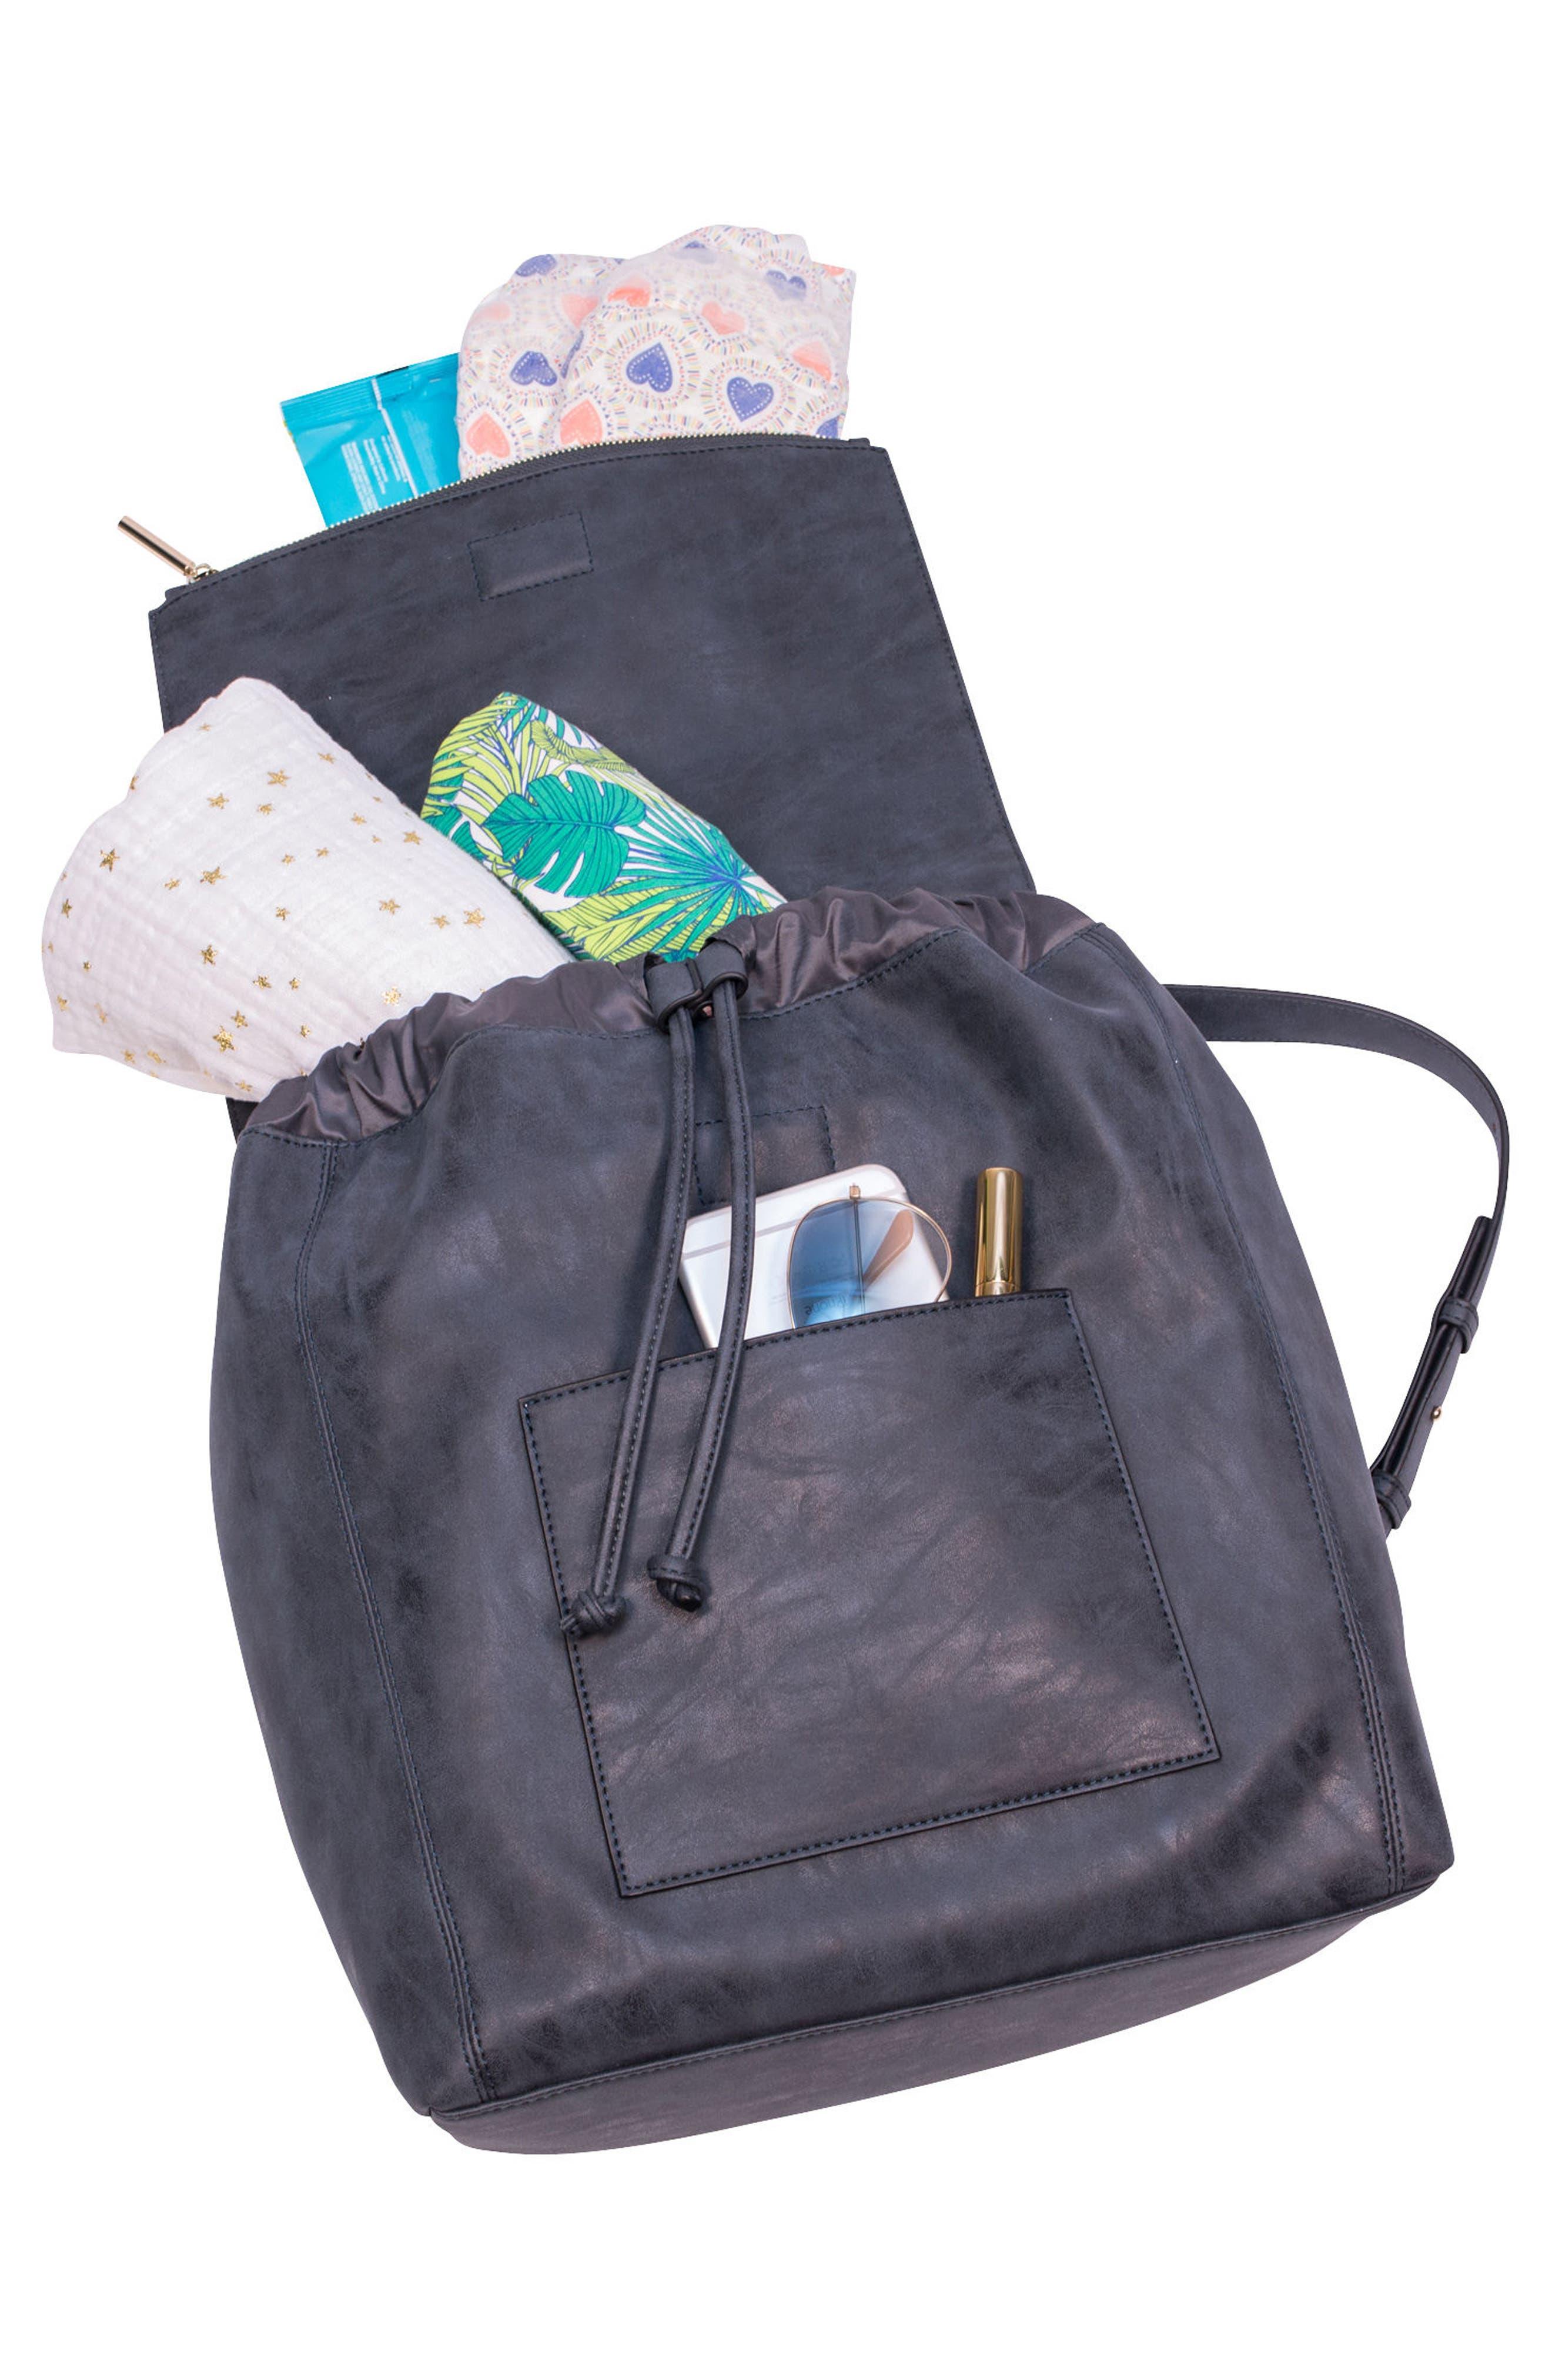 Highbury Hill Diaper Backpack,                             Alternate thumbnail 2, color,                             DUSTY NAVY